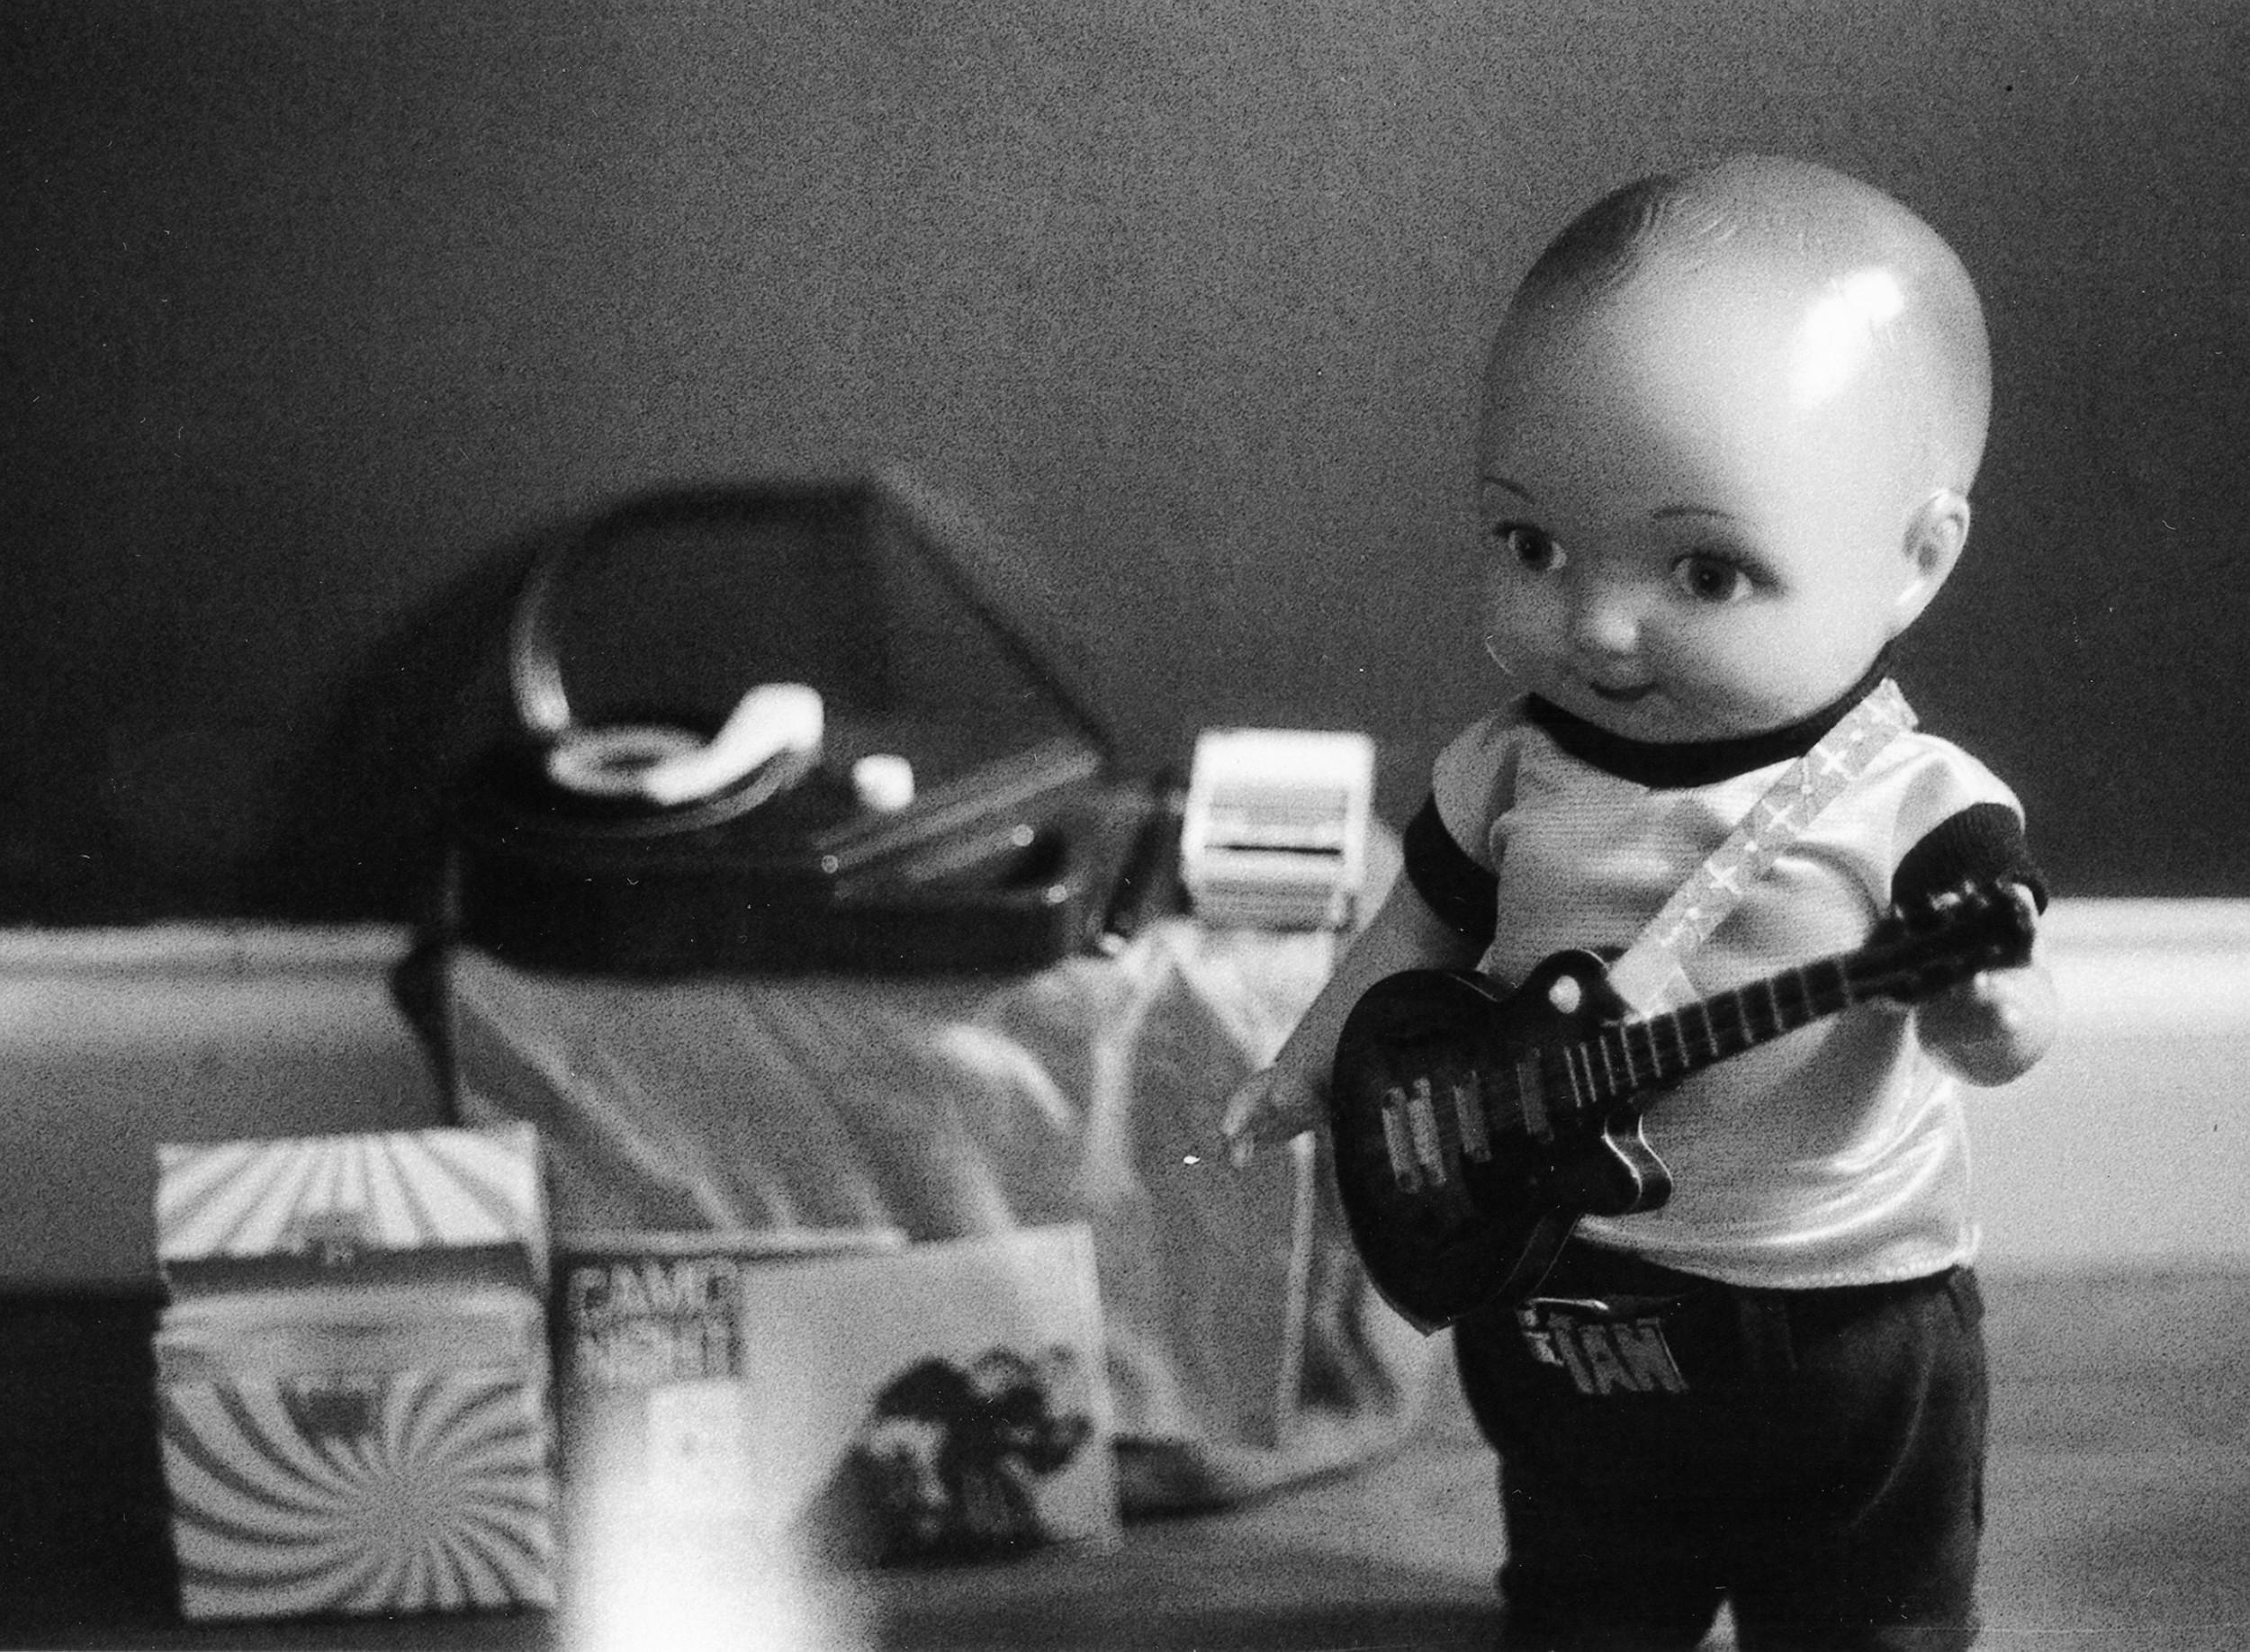 Buddy_Guitar_solo.jpg